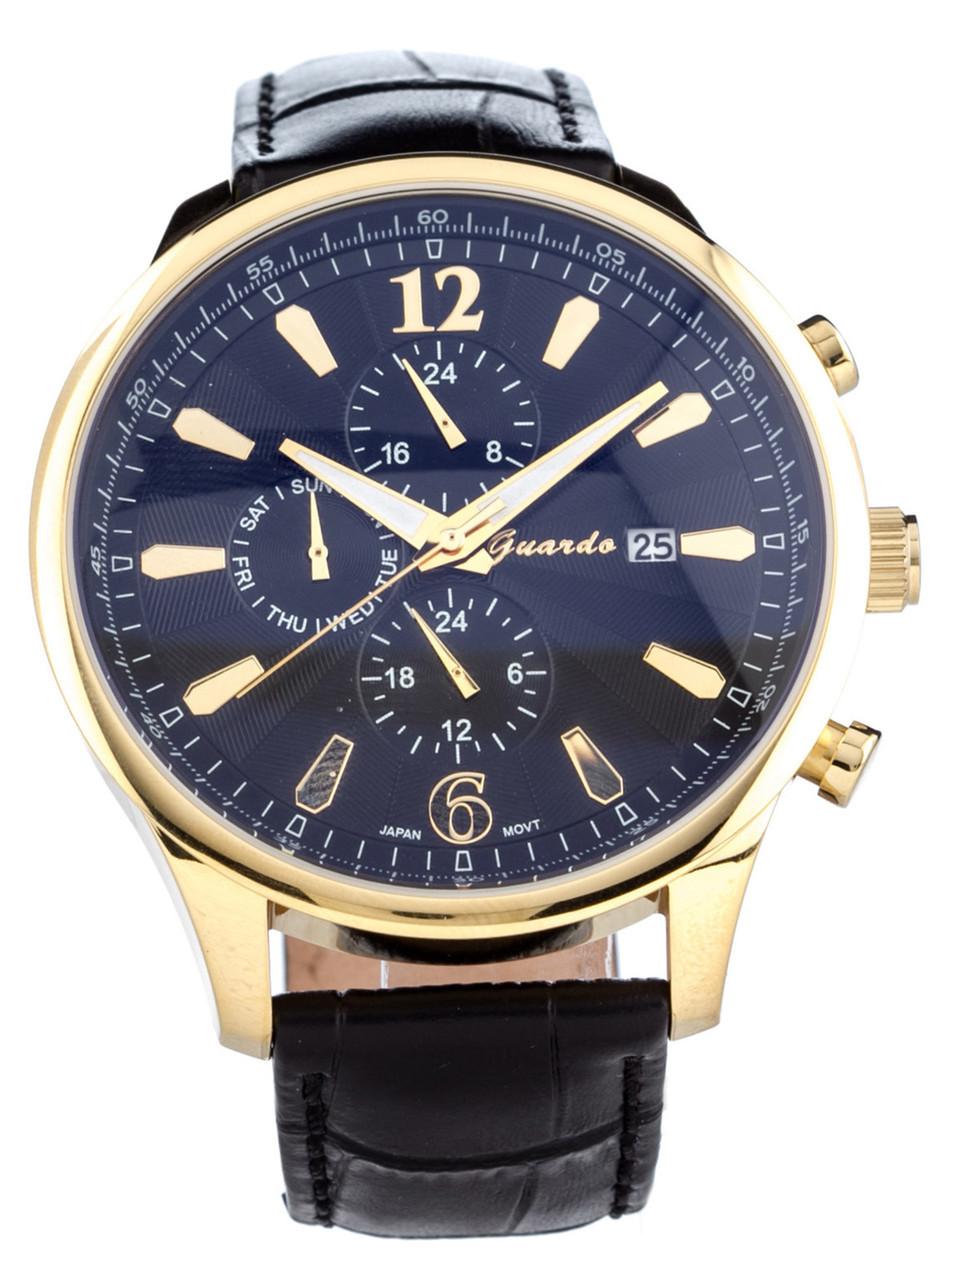 Мужские наручные часы Guardo S01032 GBB